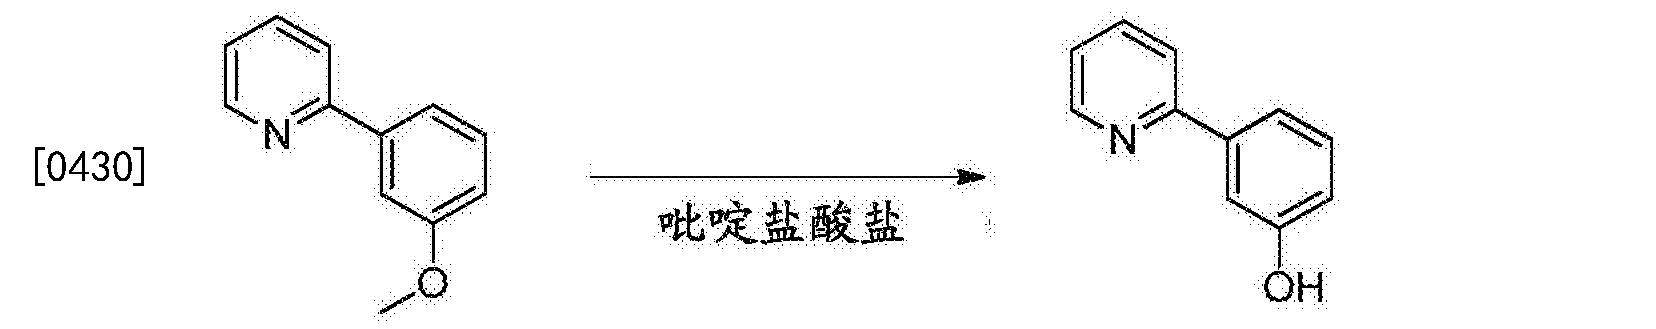 Figure CN106749425AD01411